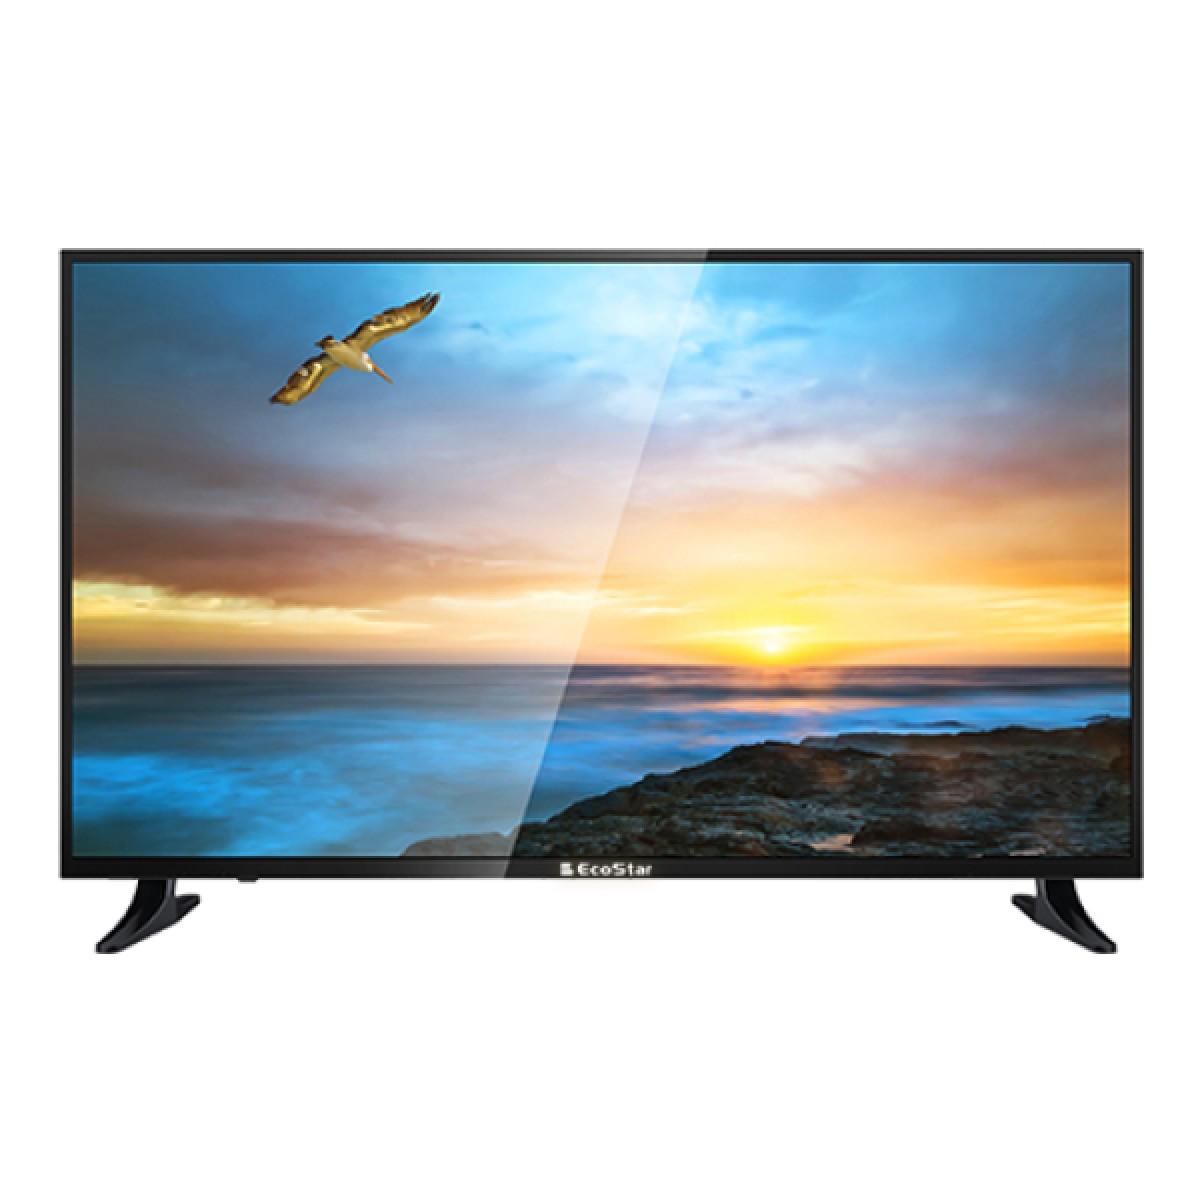 EcoStar 43 Inch 43U571 LED TV